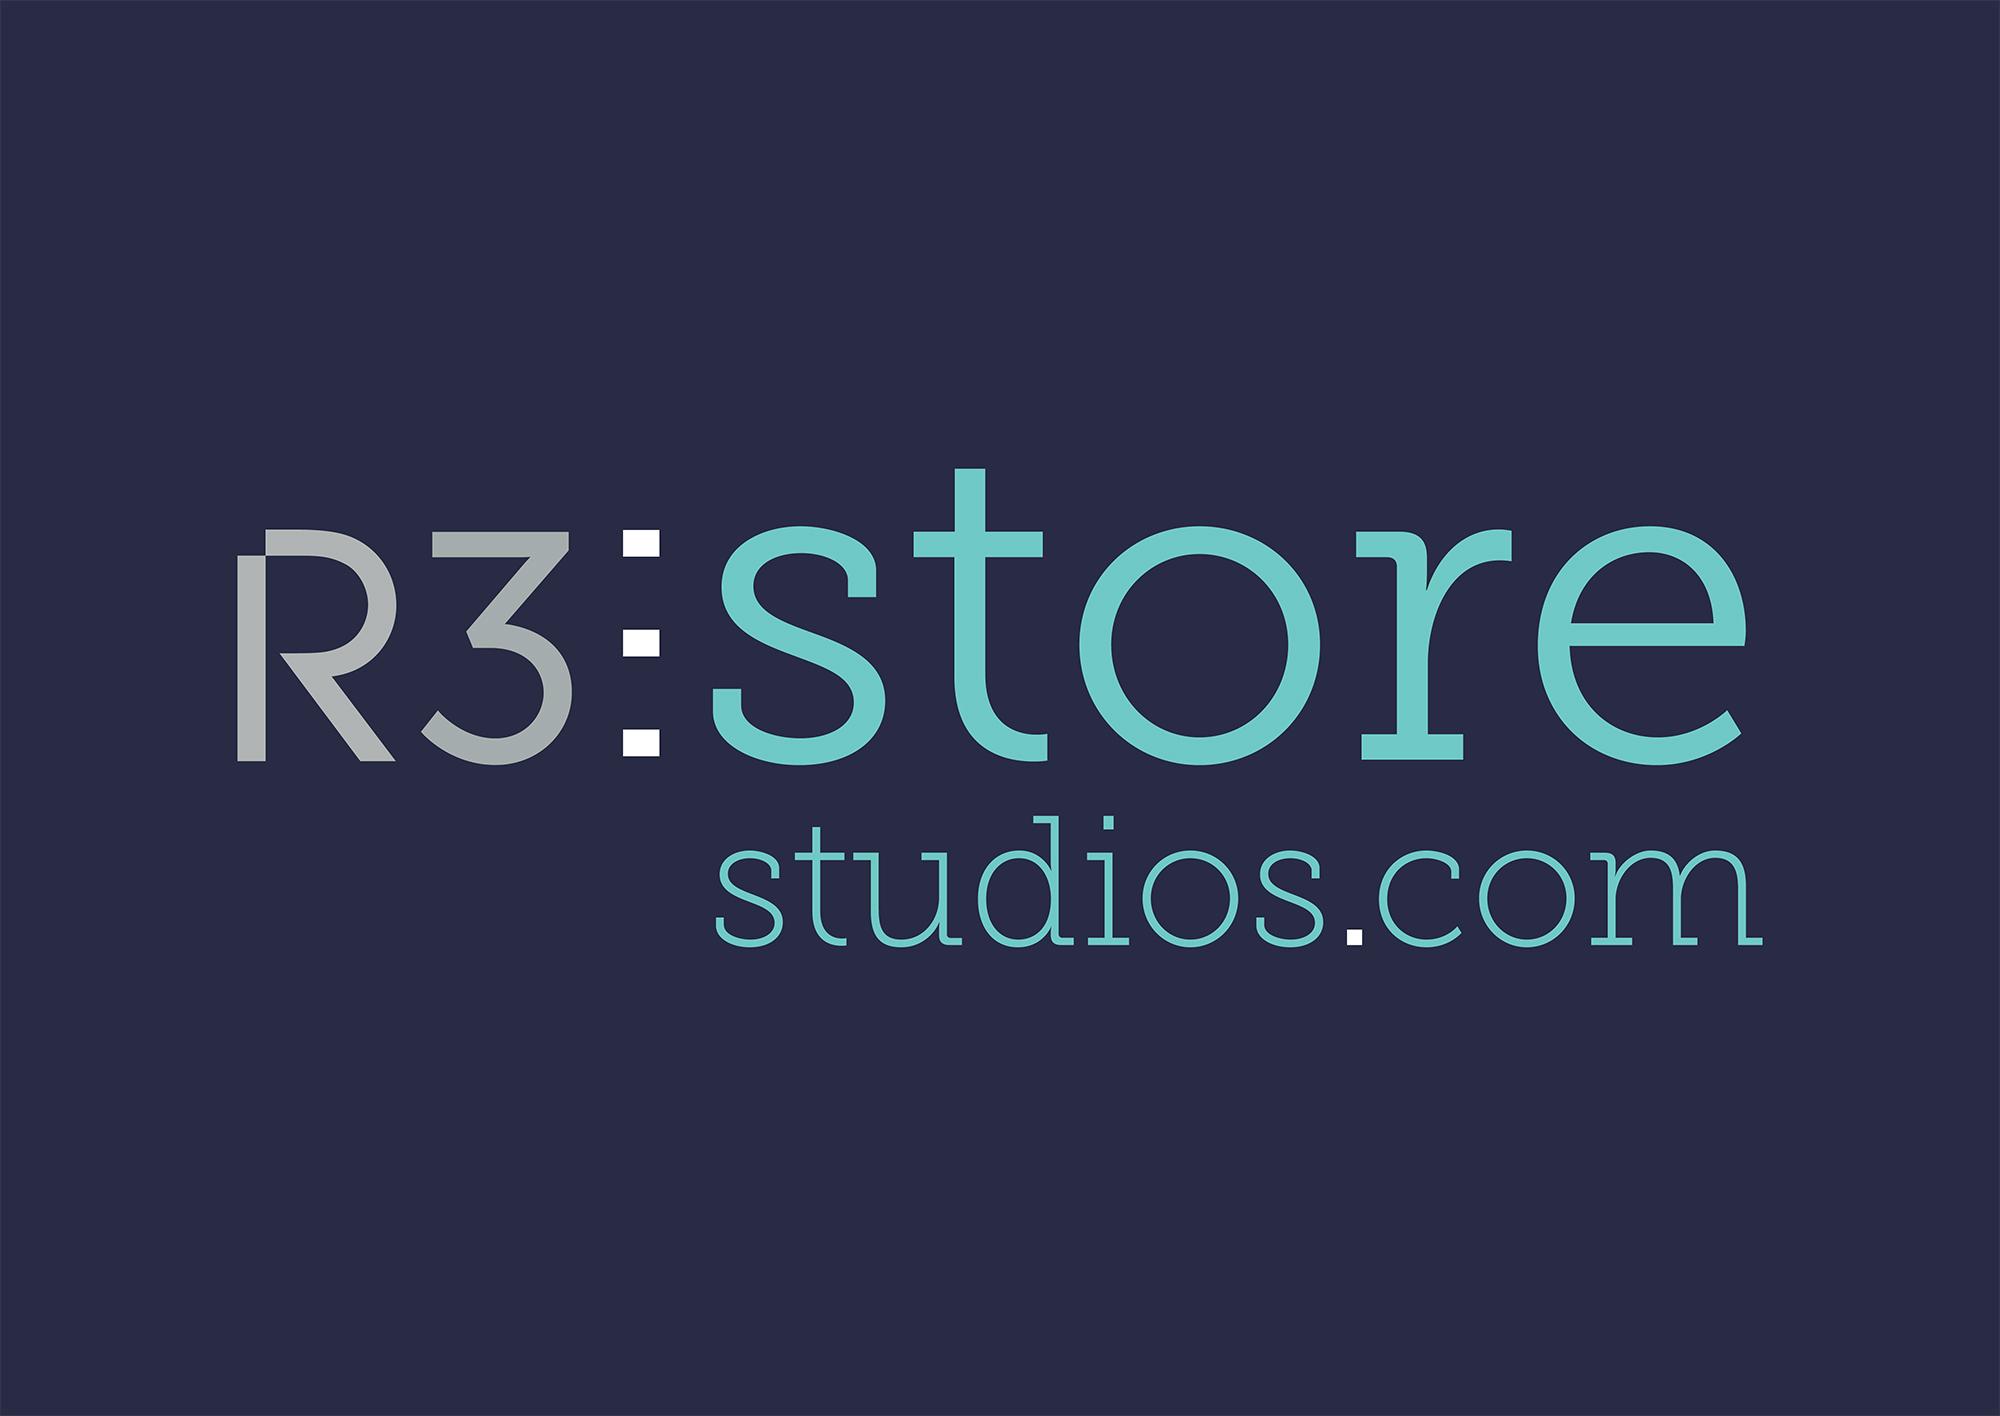 R3Store Studios